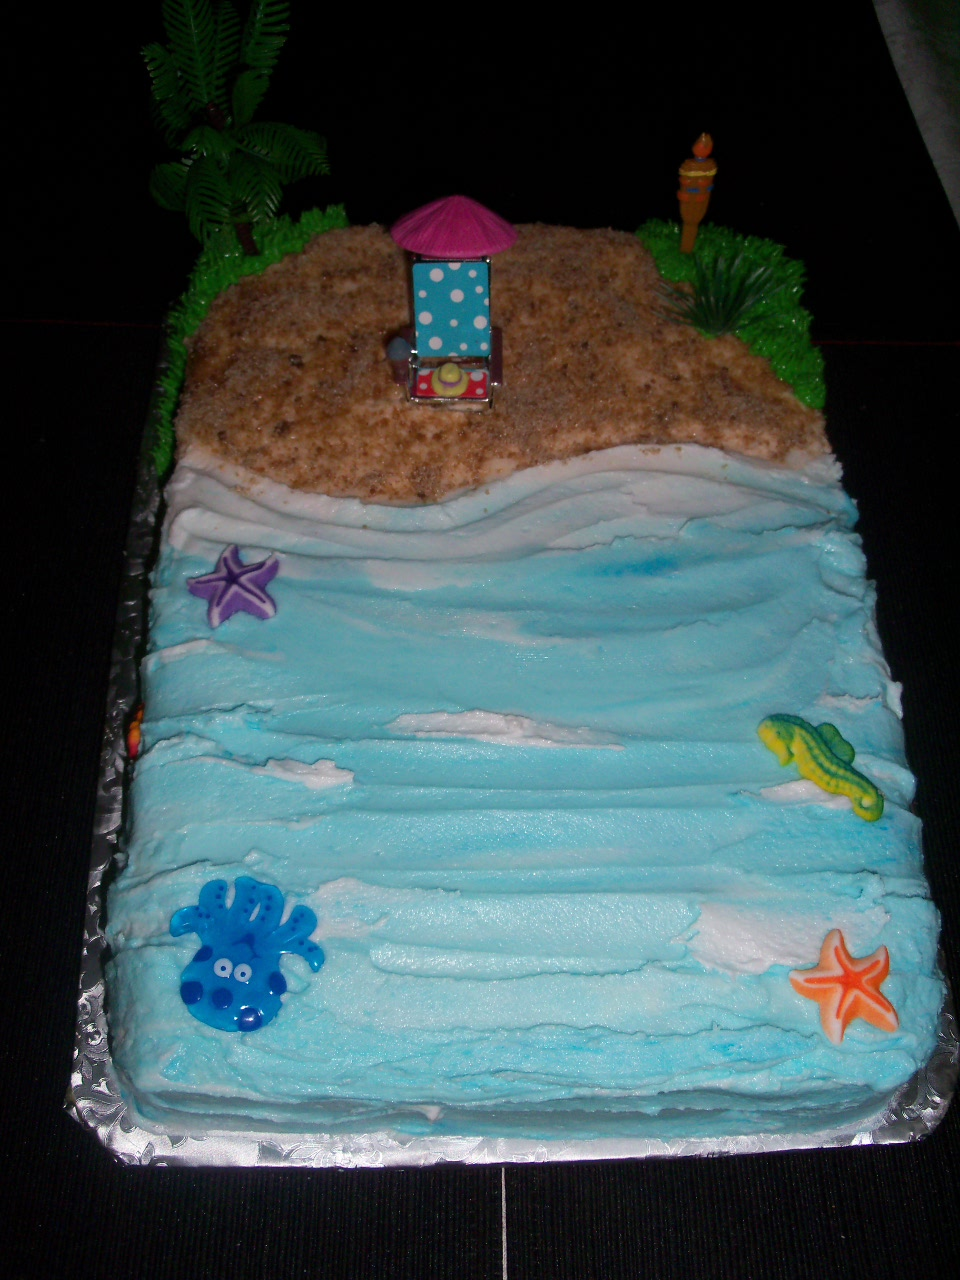 Beach Scene Birthday Cake From Sugarlicious Ltd  LONG HAIRSTYLES